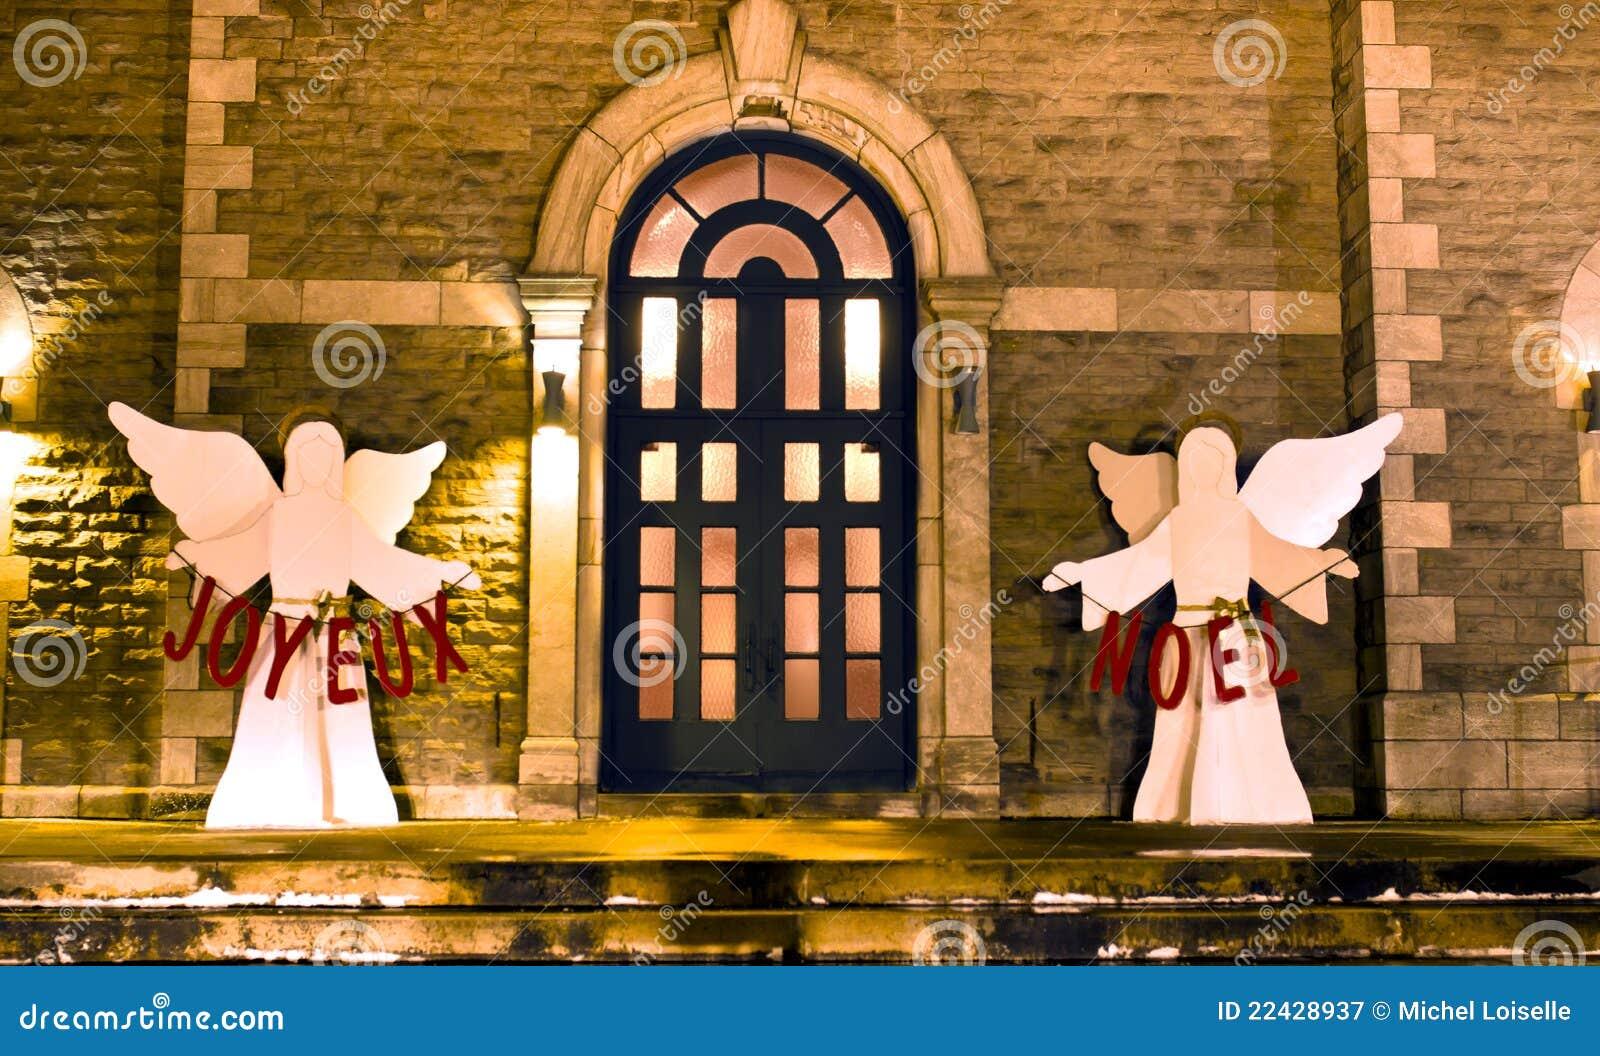 Joyeux noel royalty vrije stock fotografie afbeelding 22428937 for Decor ingang